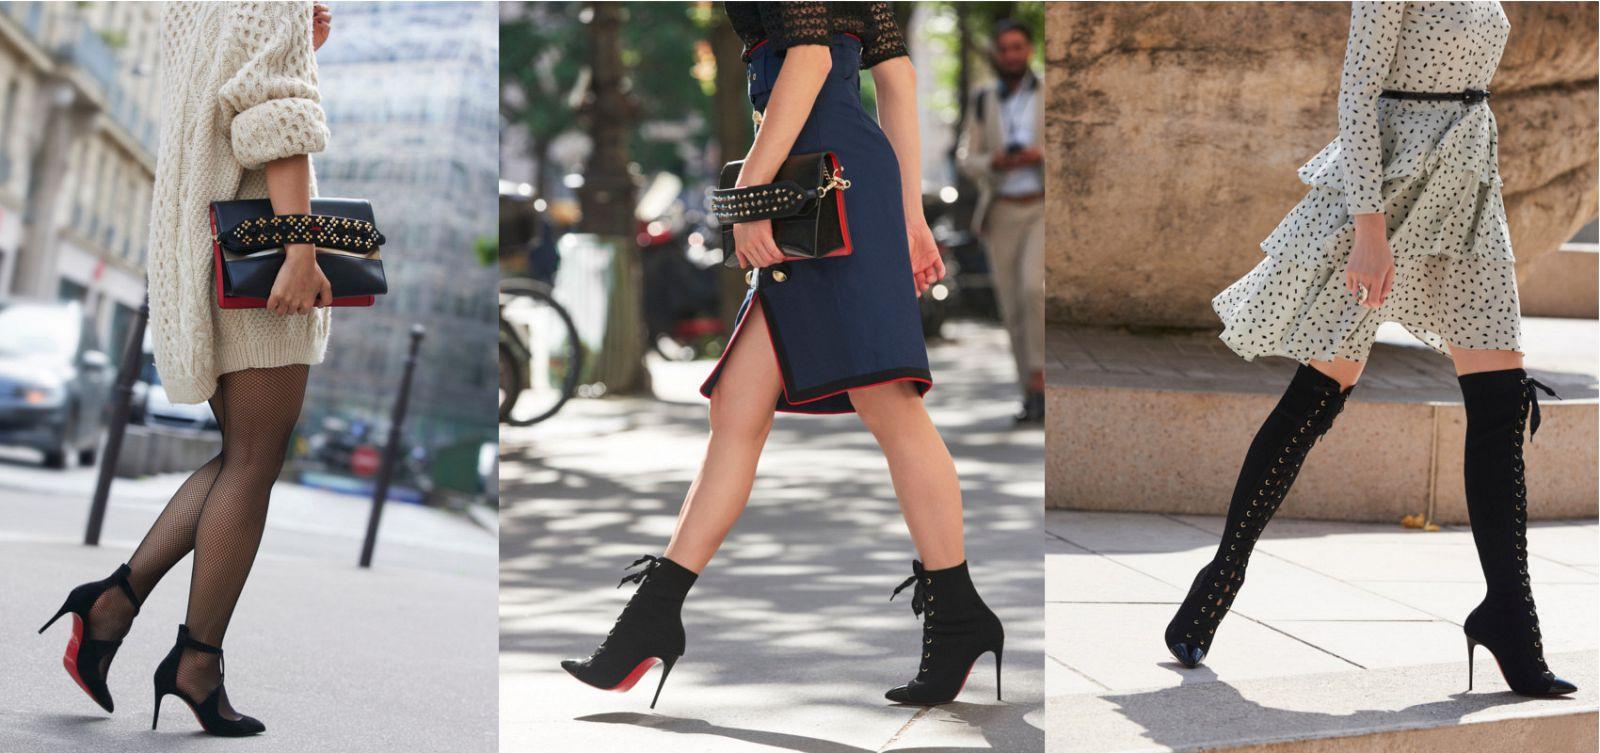 076756ab7b5 Women's Designer Boots - Christian Louboutin Online Boutique